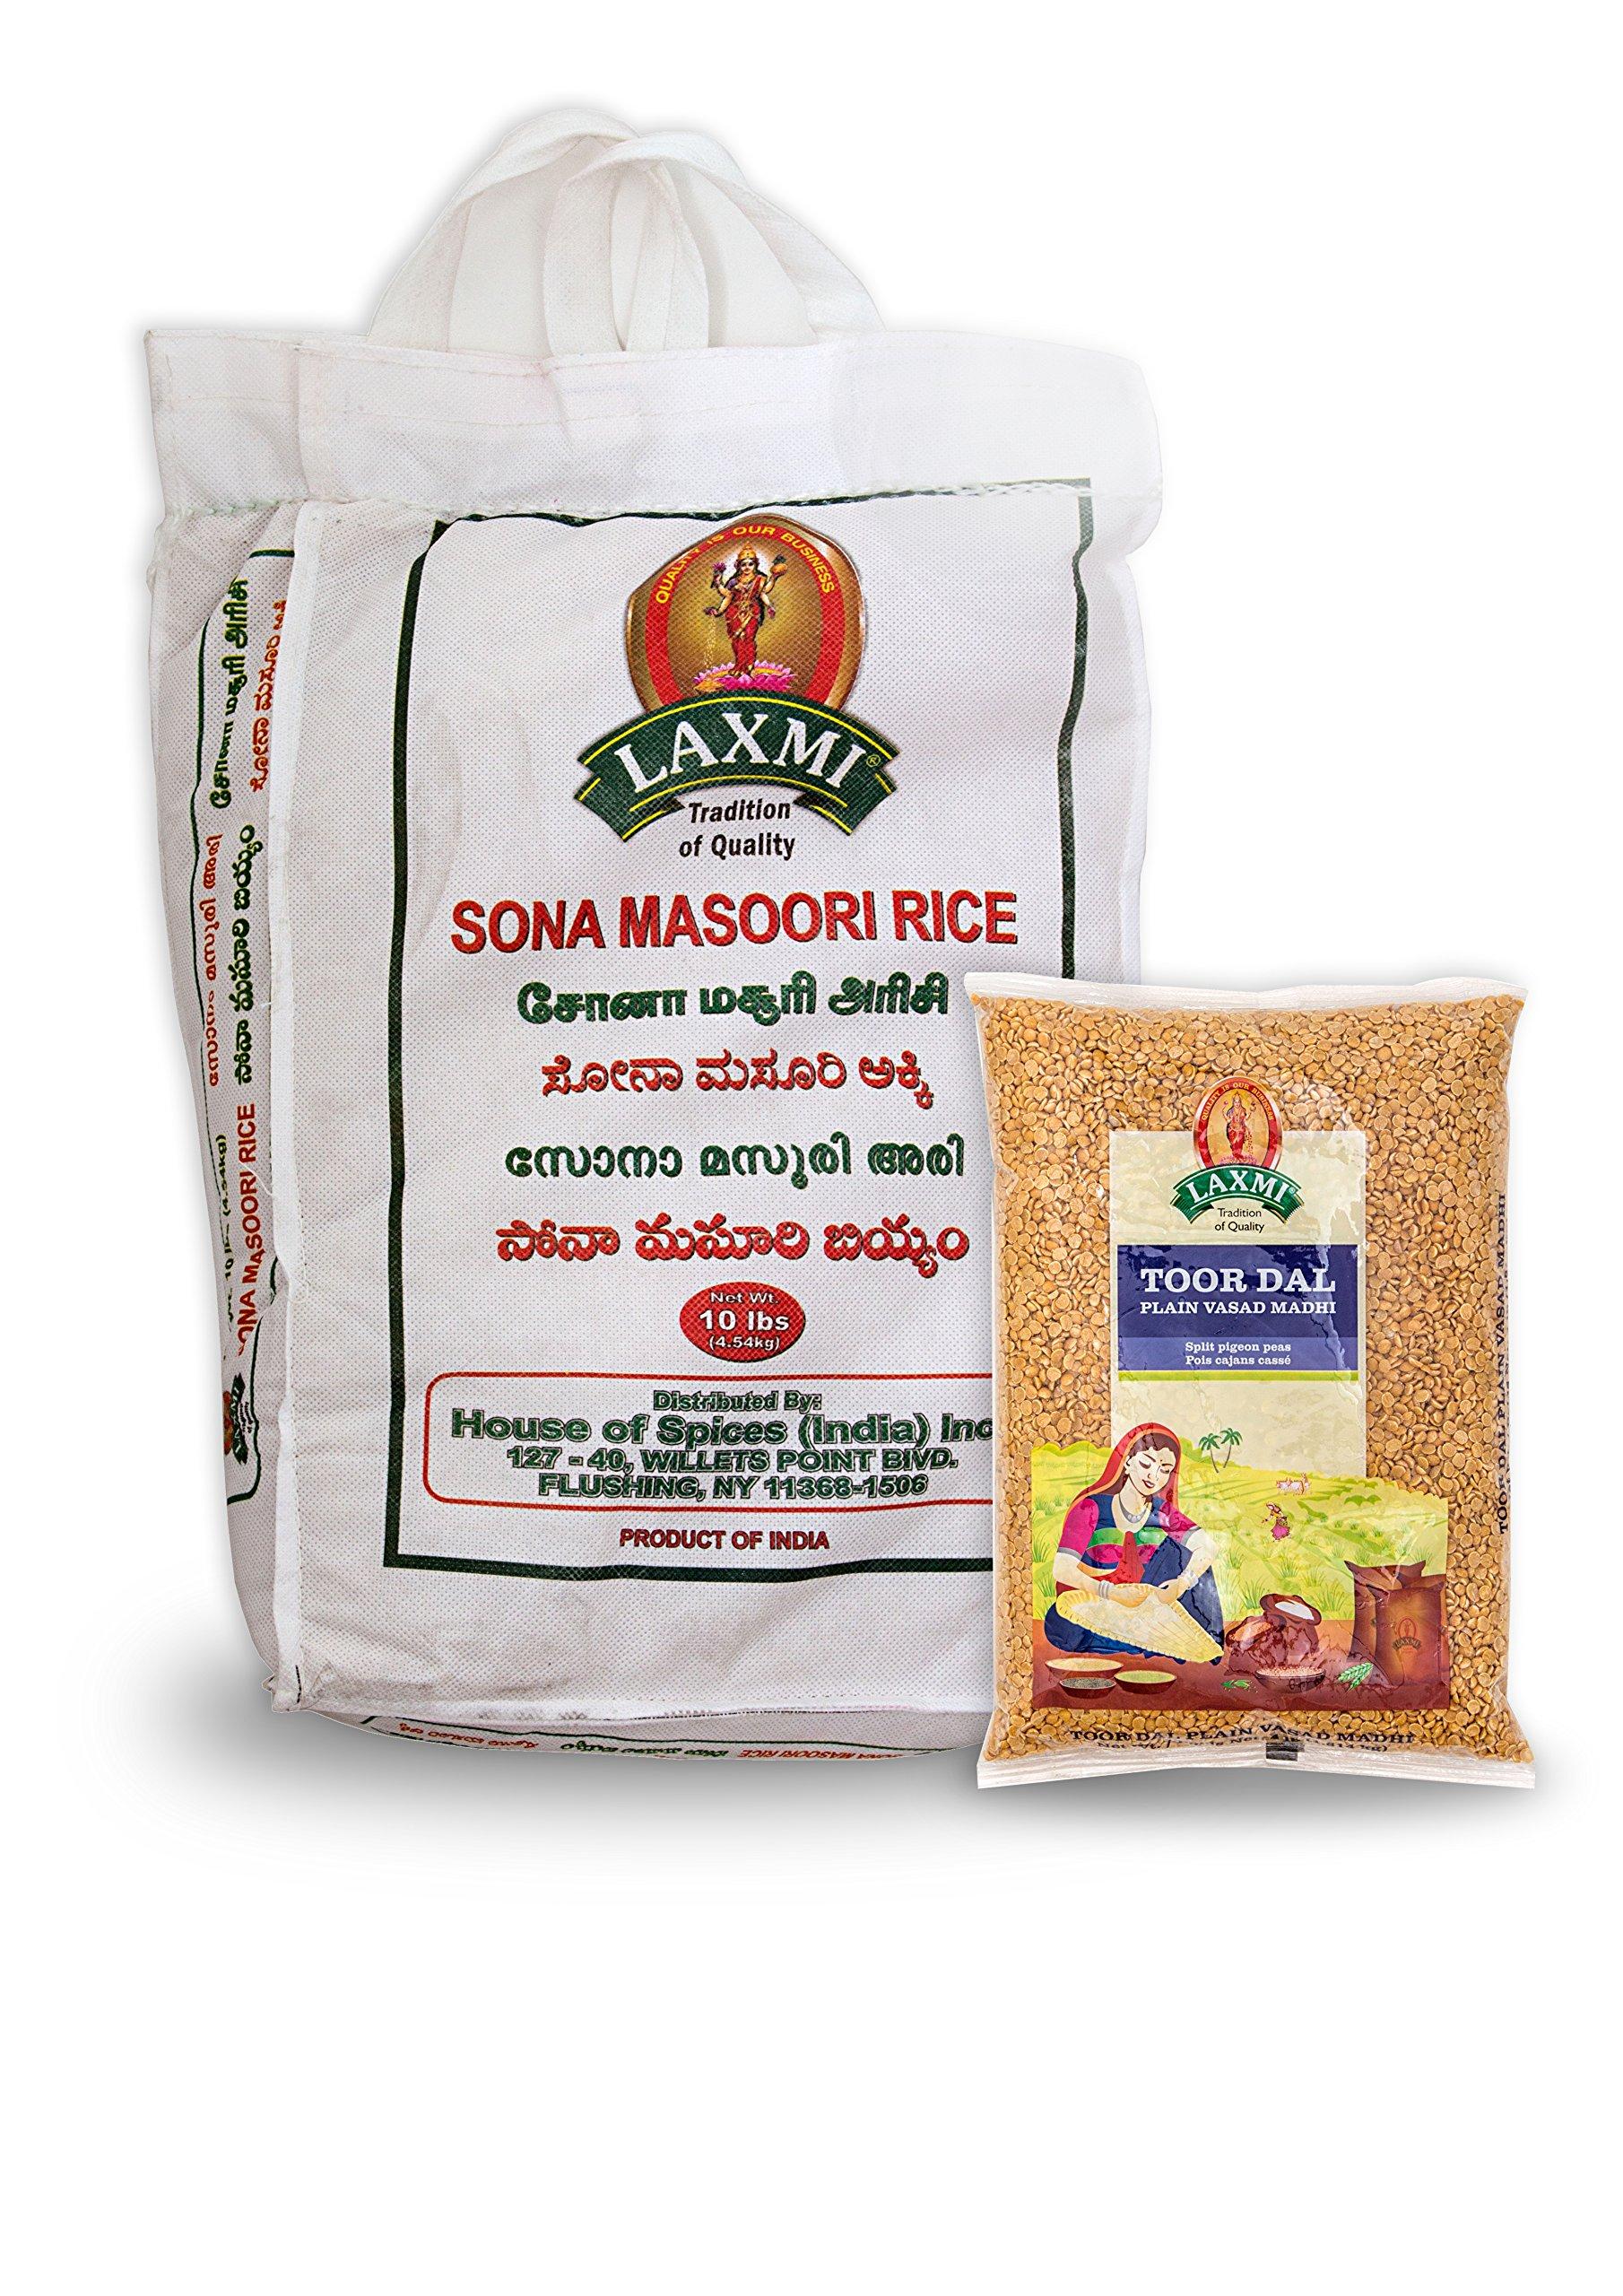 Laxmi Sona Masoori Rice & Laxmi Toor Dal Bundle - (10lb Rice and 4lb Dal)